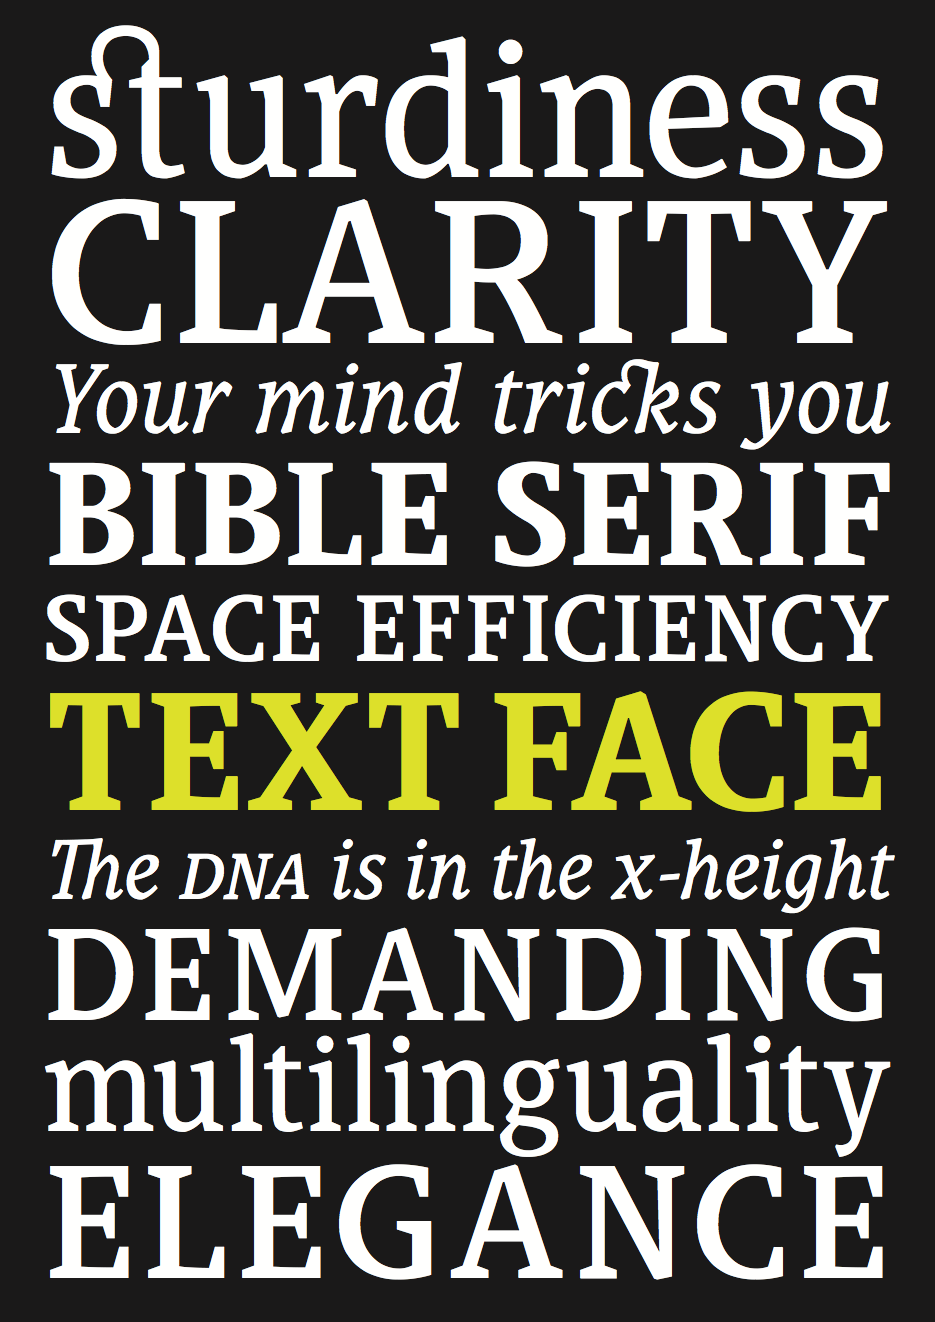 Bible Sans, Slab and Serif — 2K/DENMARK – TYPOGRAPHIC DESIGN